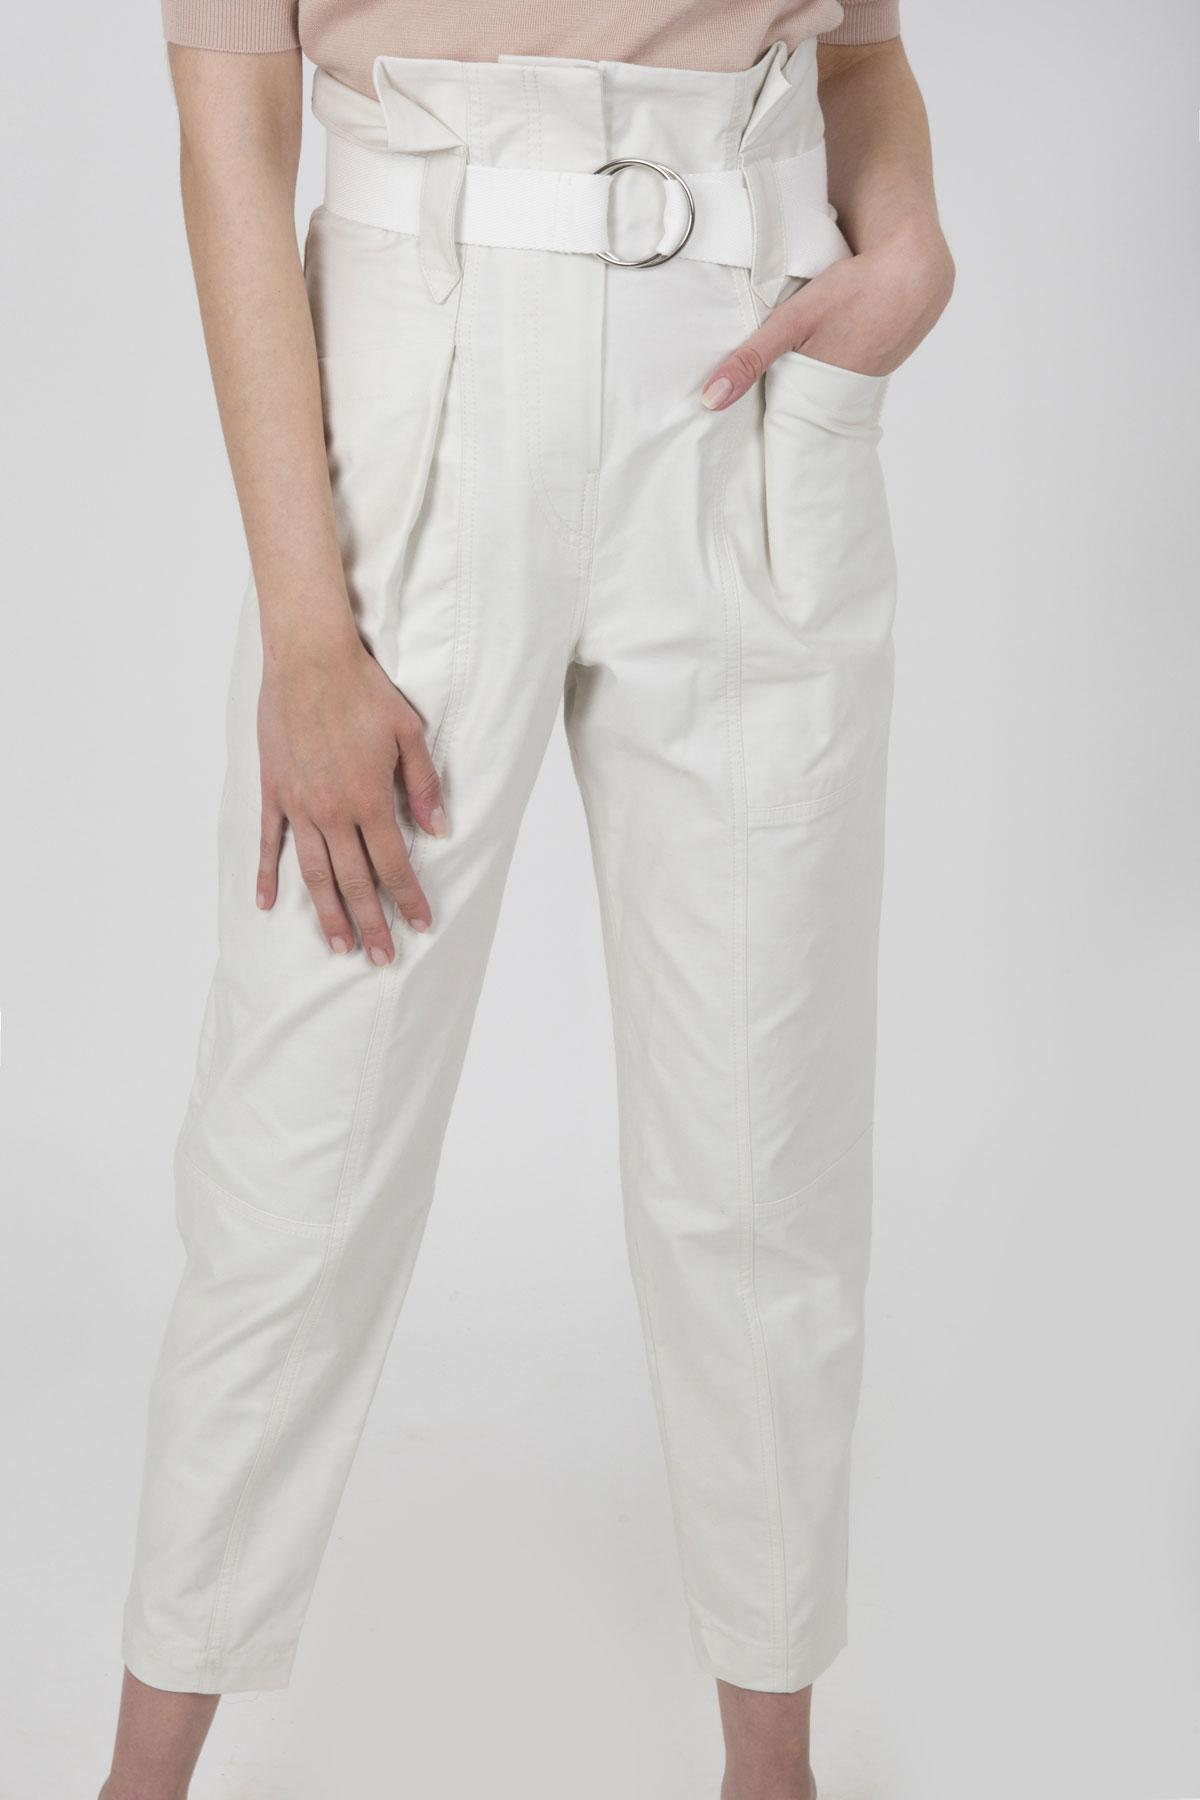 cursola-trousers-iro-high-waisted-matchboxathens